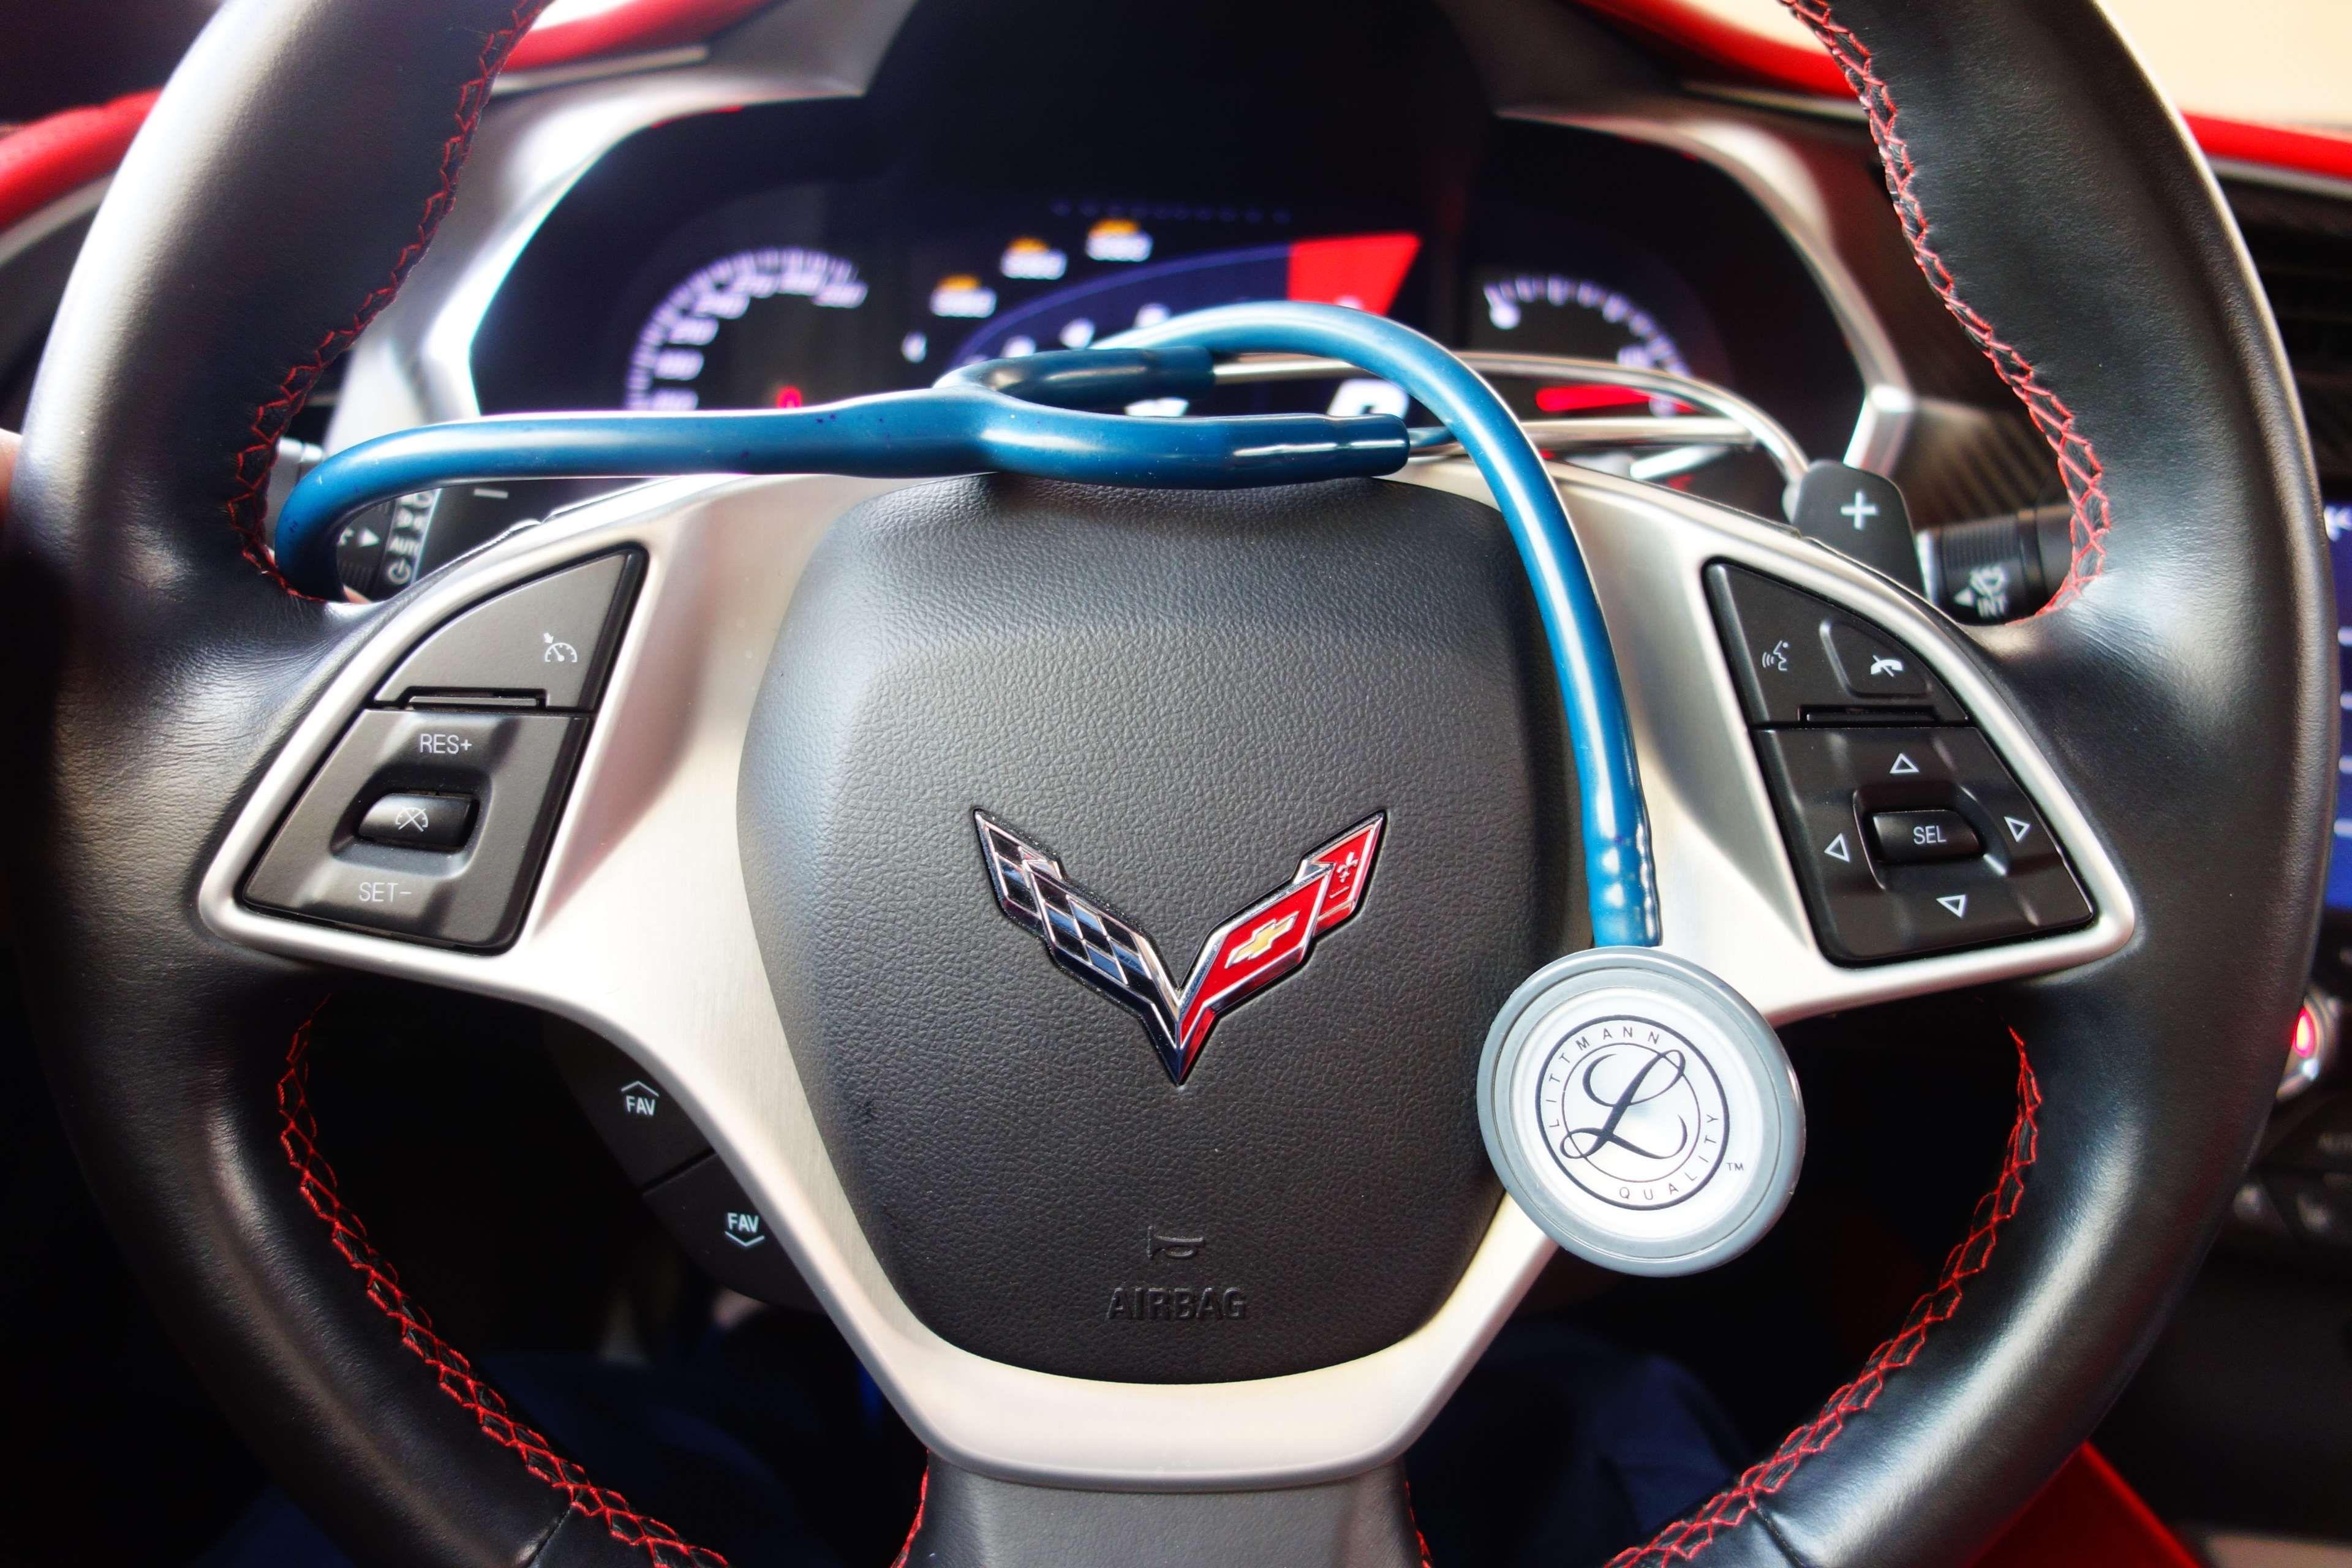 American Car Black C7 Car Car Interior Corvette Corvette C7 Dashboard Doctor Instrument Interior Medical Red Sport Stee Corvette C7 Corvette Car